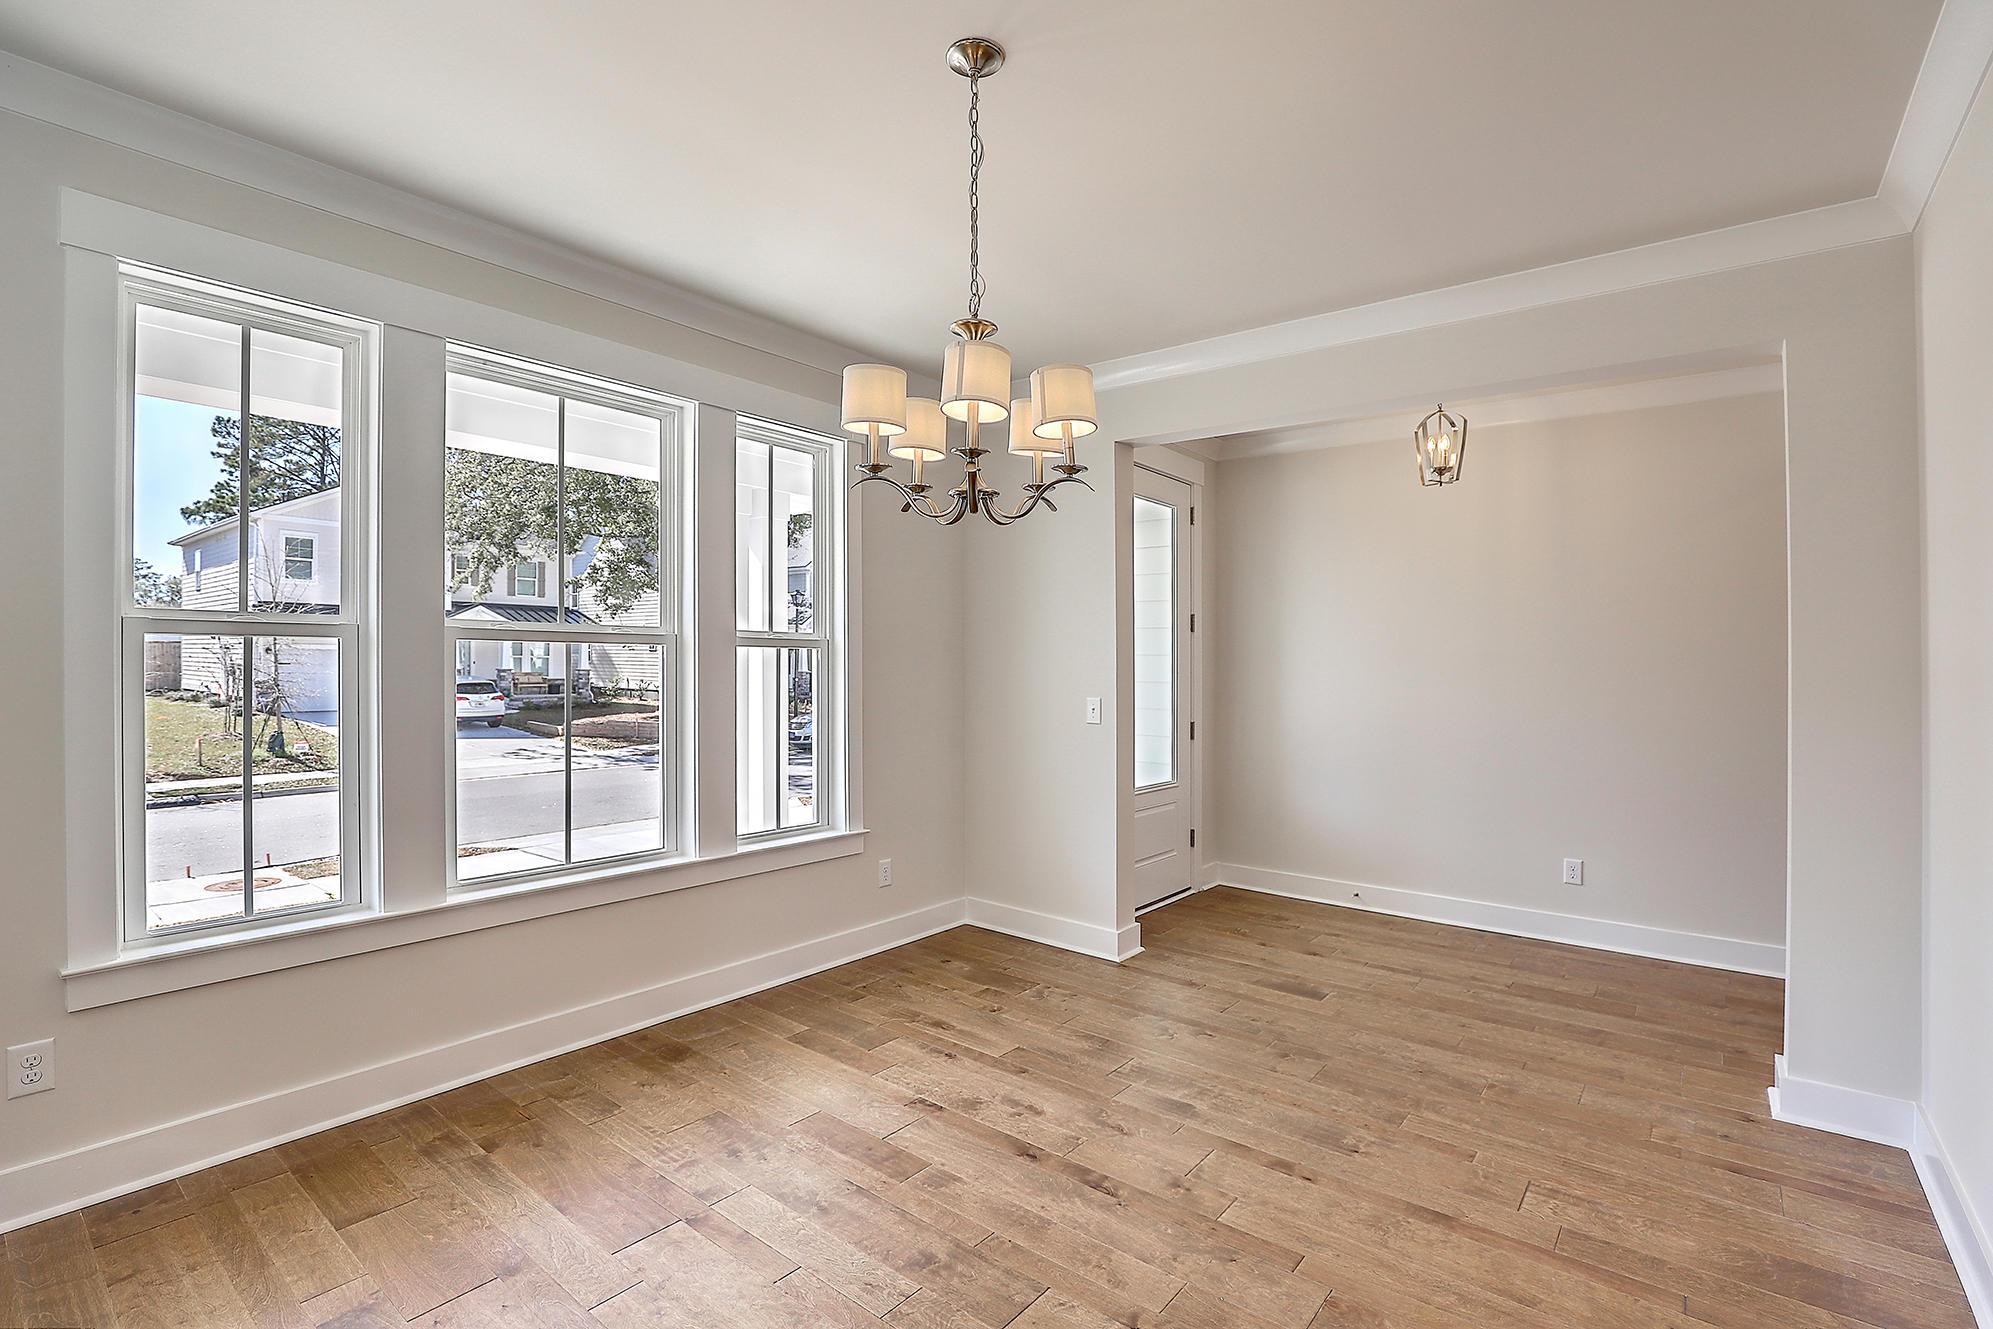 Bentley Park Homes For Sale - 1218 Gannett, Mount Pleasant, SC - 10